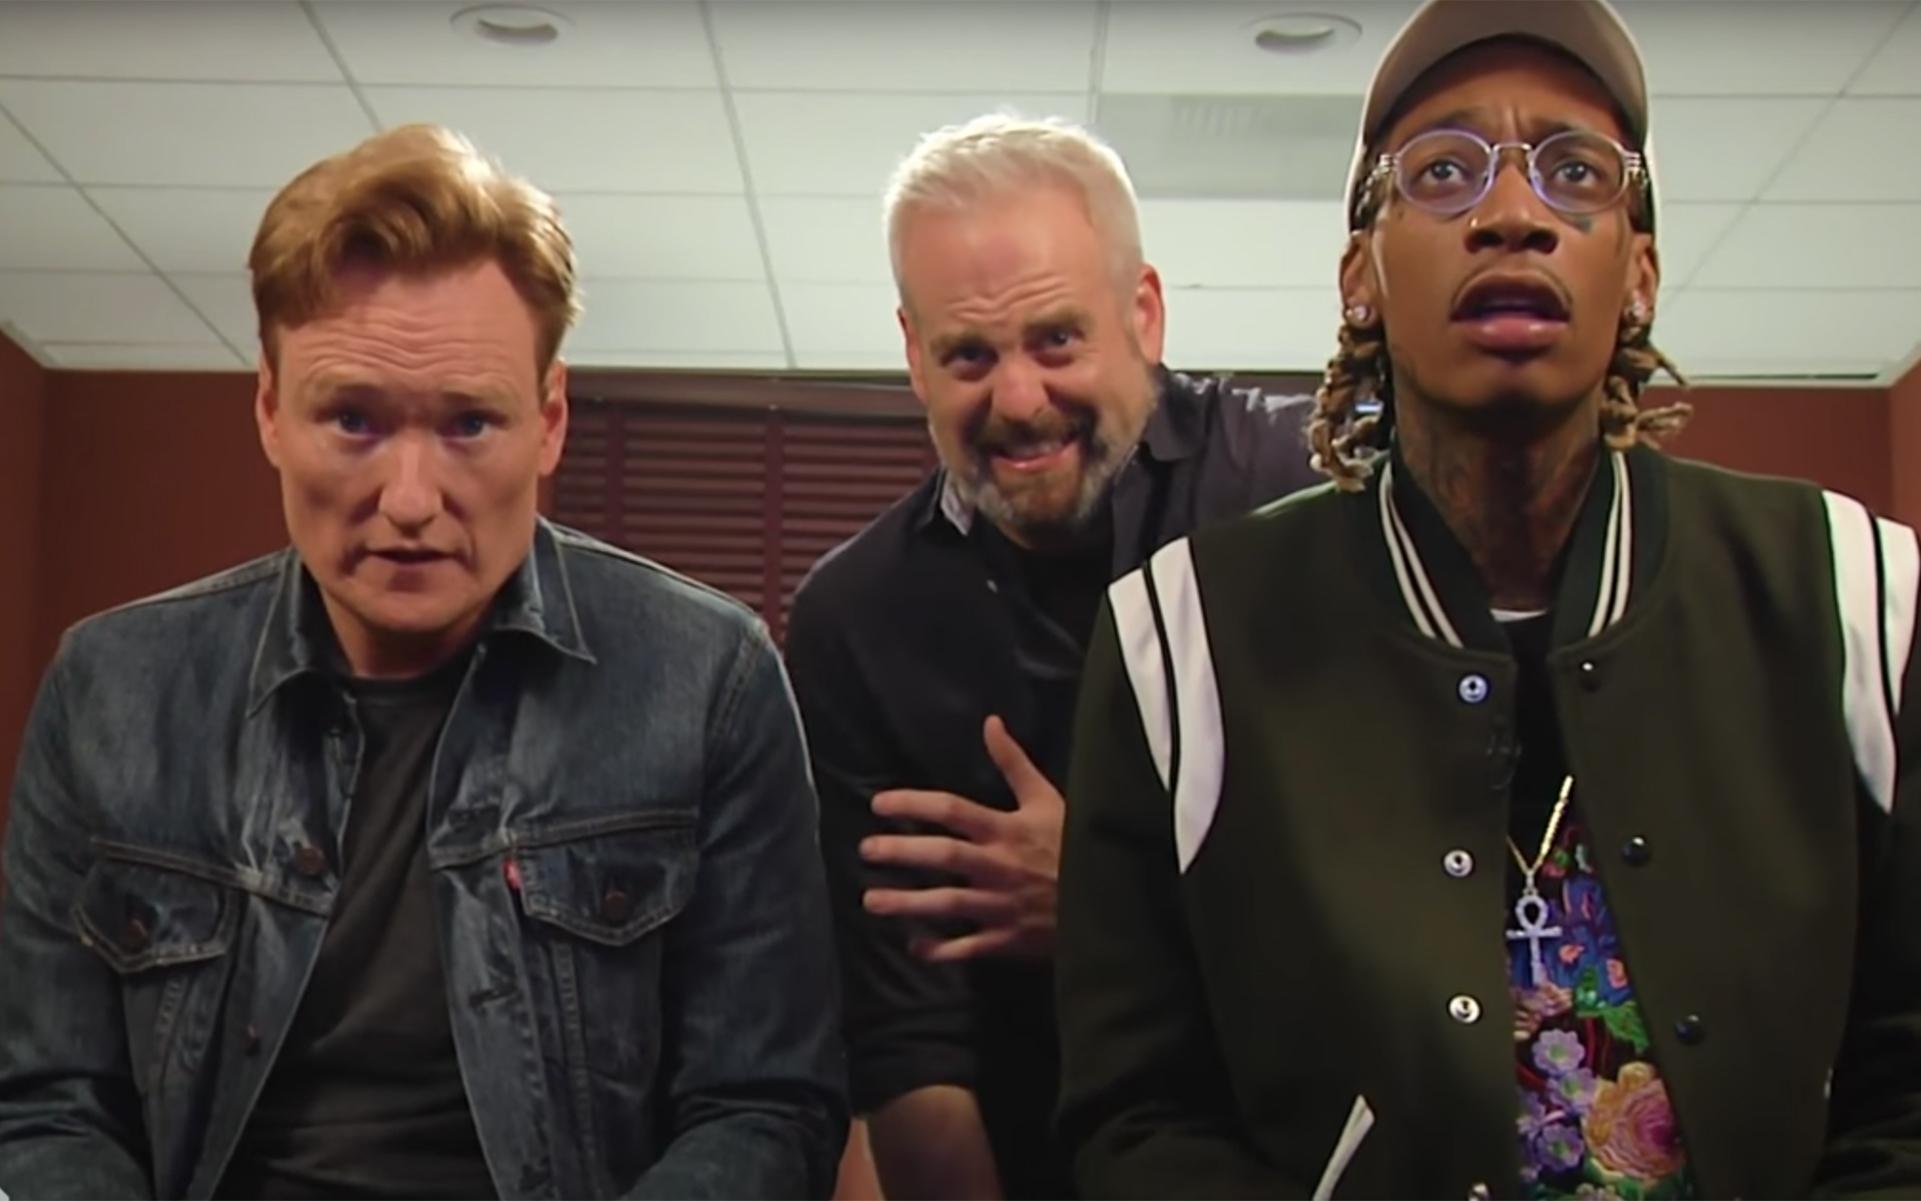 Watch This: Conan and Wiz Khalifa Get High, Play 'Gears of War 4', Eat Potato Salad